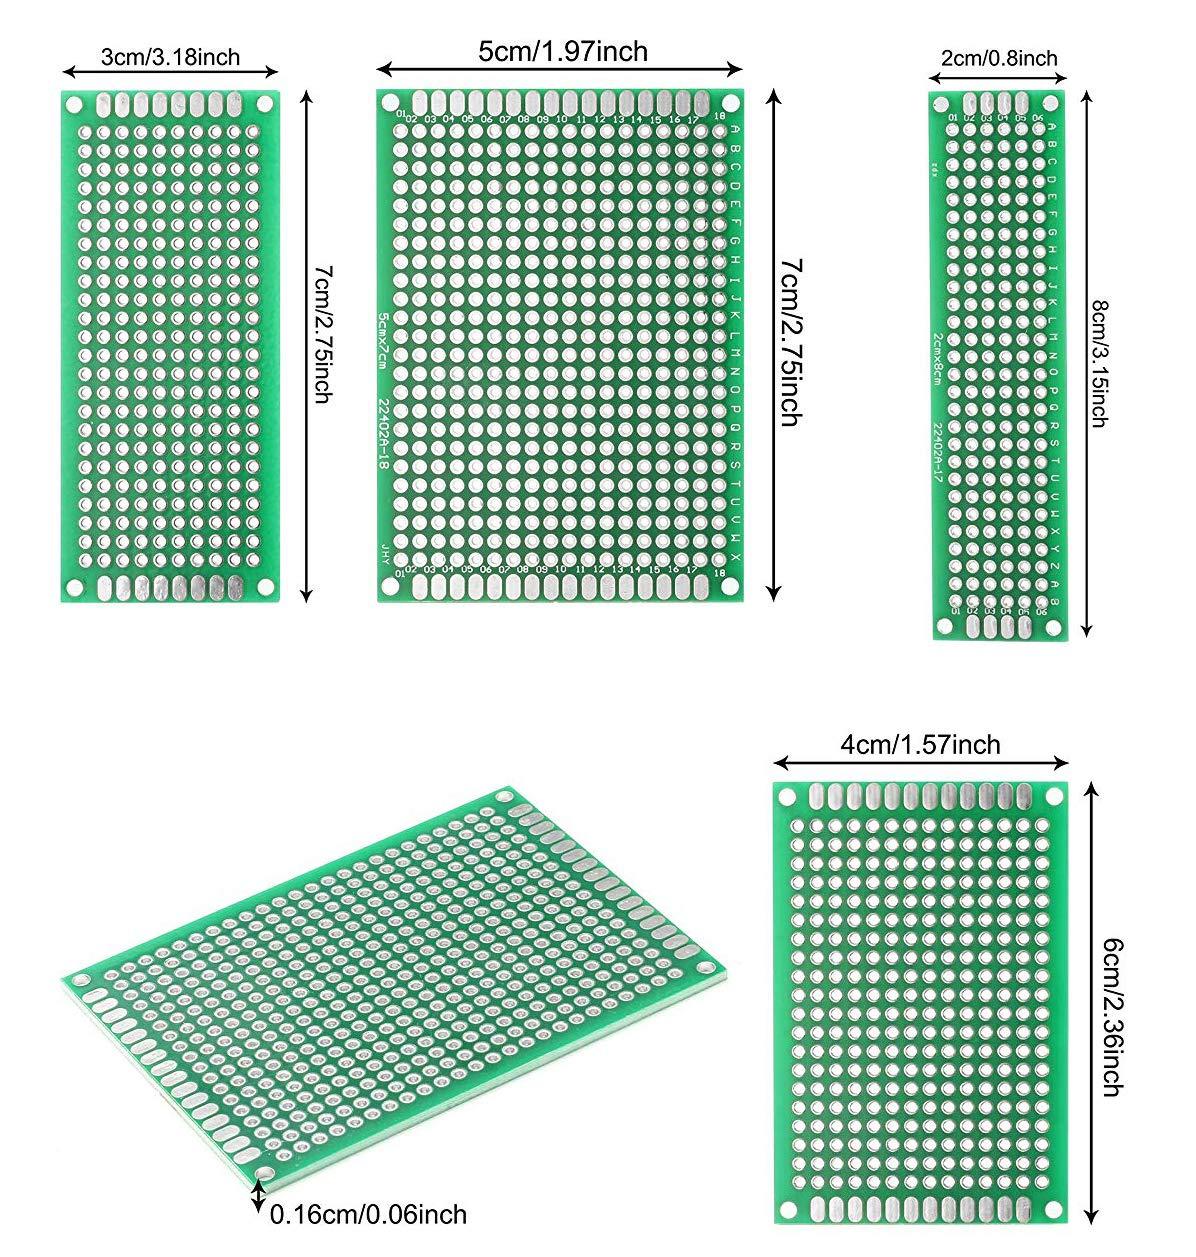 30 PCB Universal Board 30 Jumper Caps 30 Kopfleiste ALLDREI 100Stk leiterplatte Kit 10 Screw Terminal